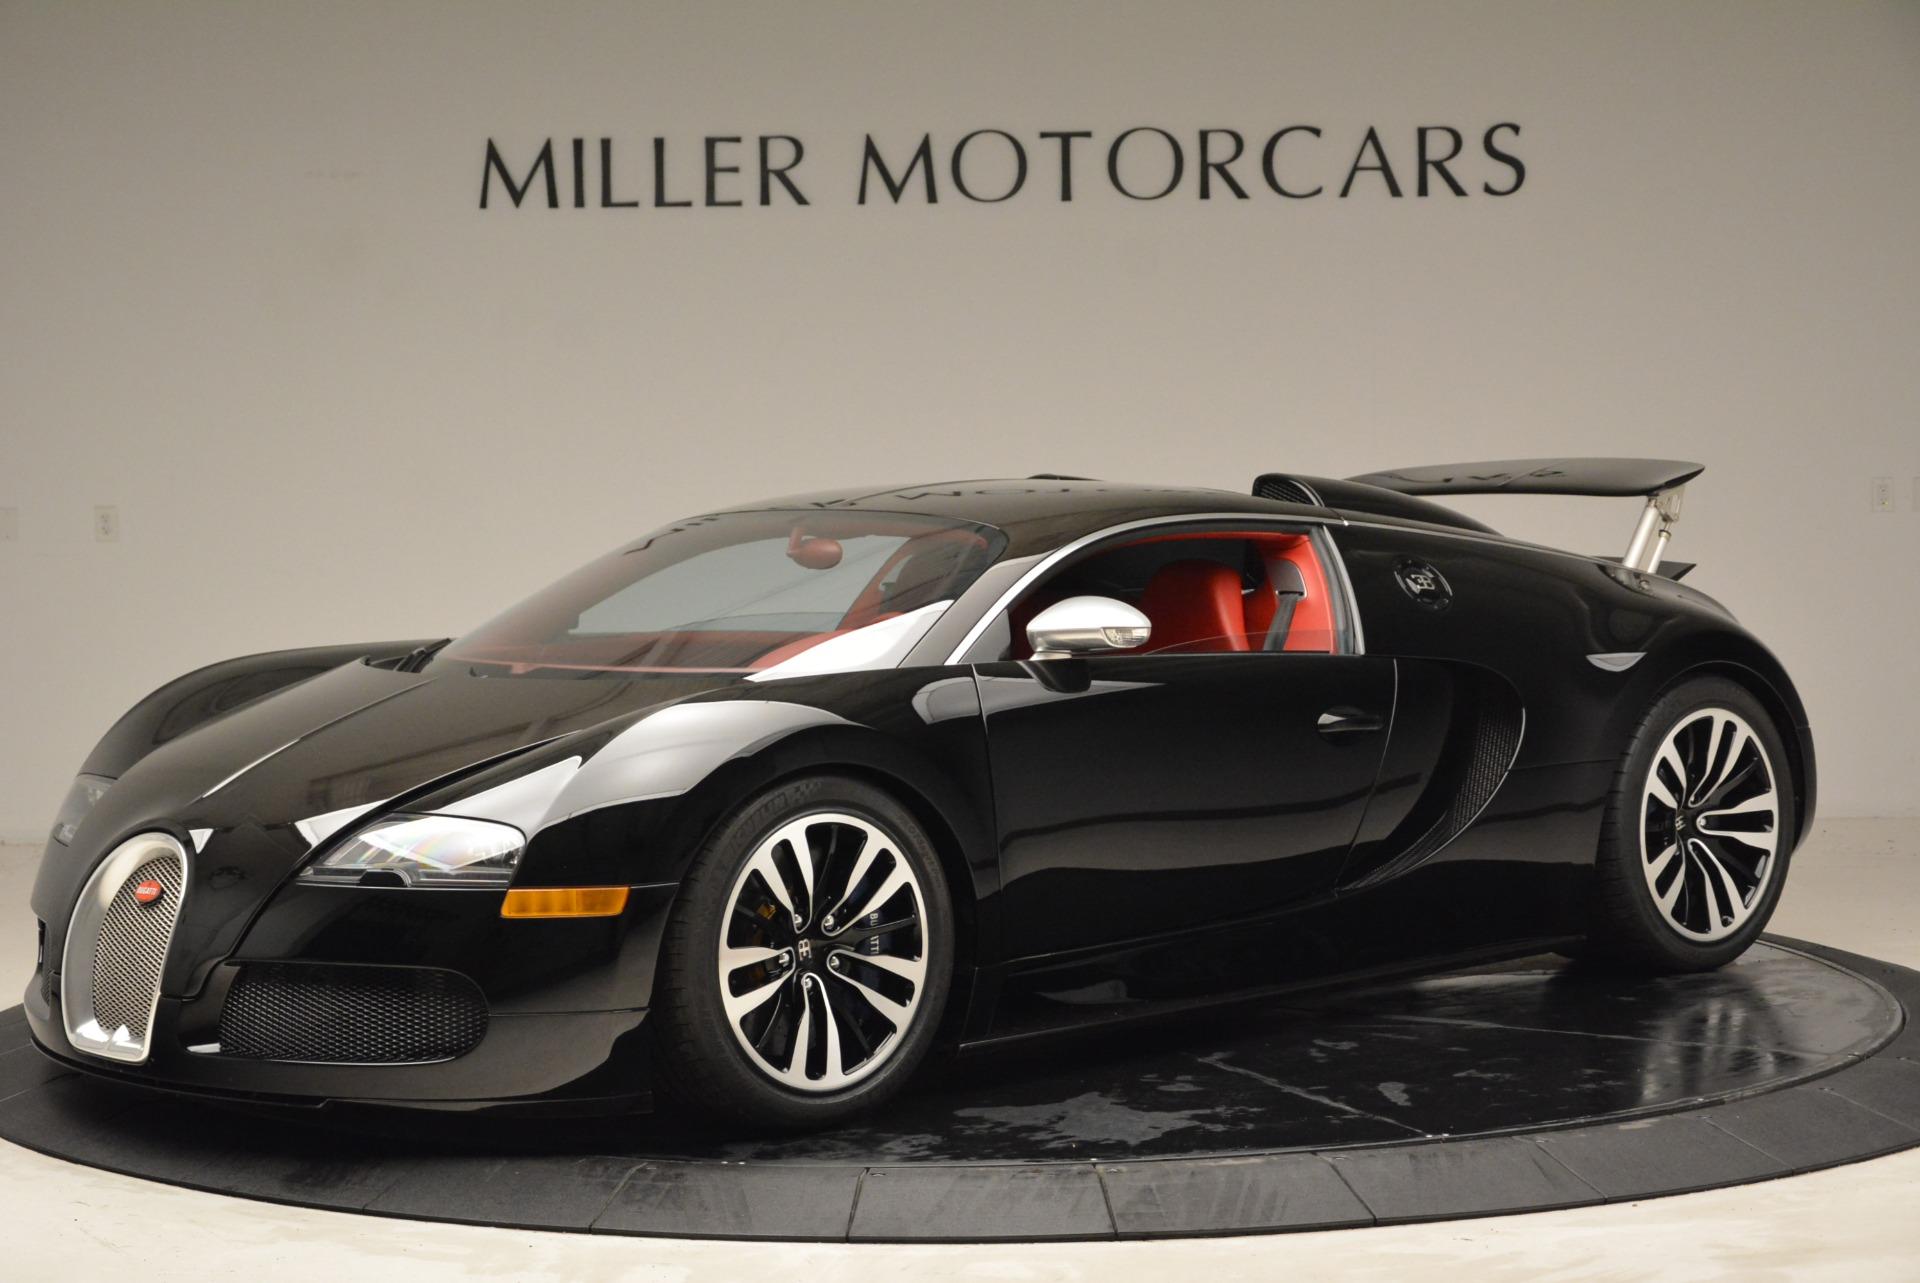 Bugattis For Sale >> 2010 Bugatti Veyron 16 4 Sang Noir Stock 7342c For Sale